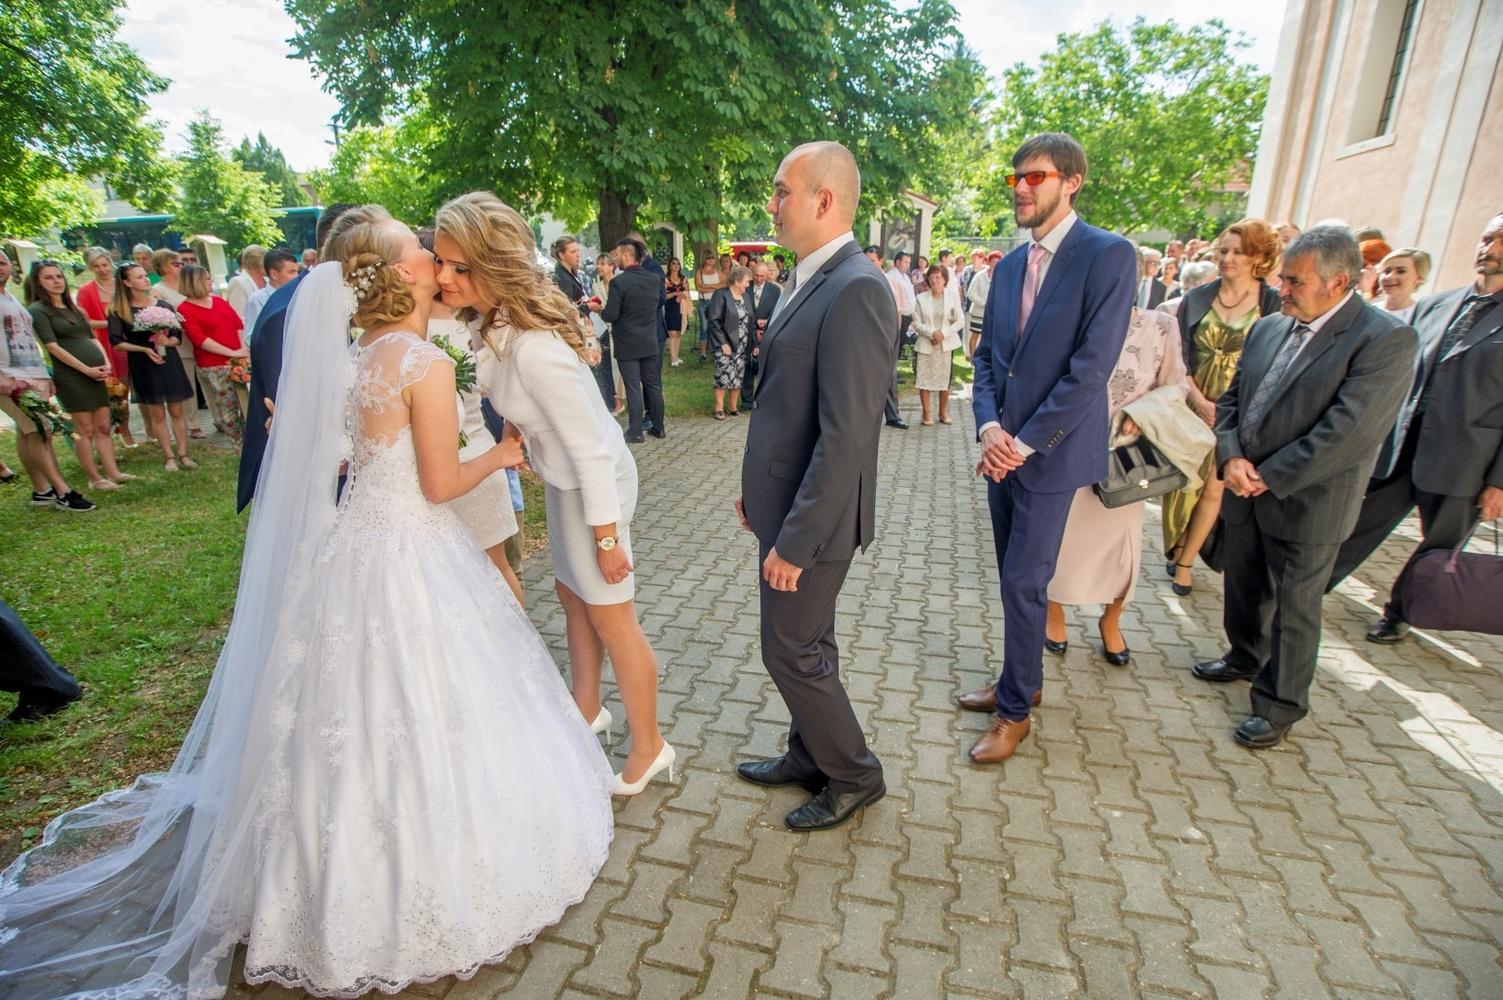 http://www.fotoz.sk/images/gallery-18/normal/eskuvo-fotozas_svadobne-fotenie_479.jpg